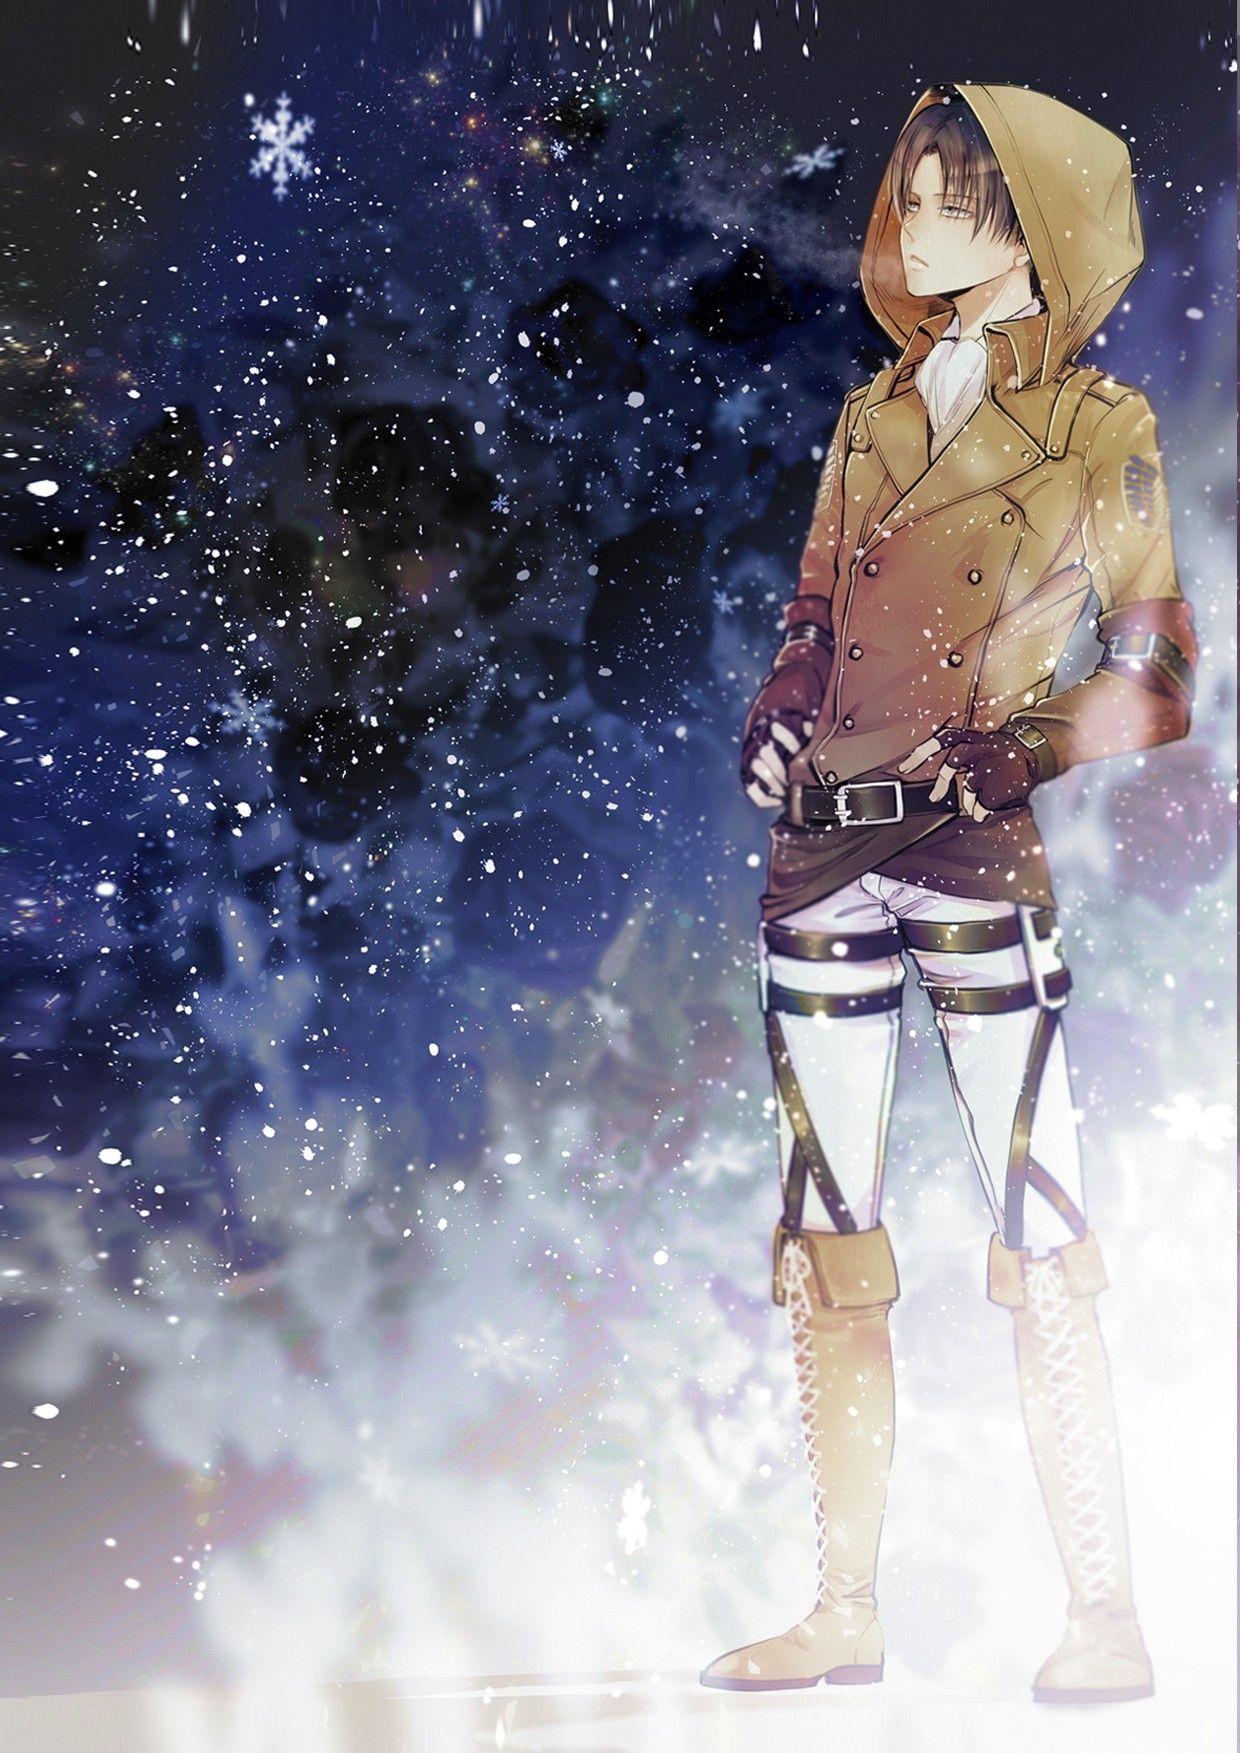 Anime Attackontitan Attackontitanfanart Attackontitanart Attackontitananime 进击的巨人 リヴァイ兵長のコスプレ レヴィ アッカーマン リヴァイ かっこいい